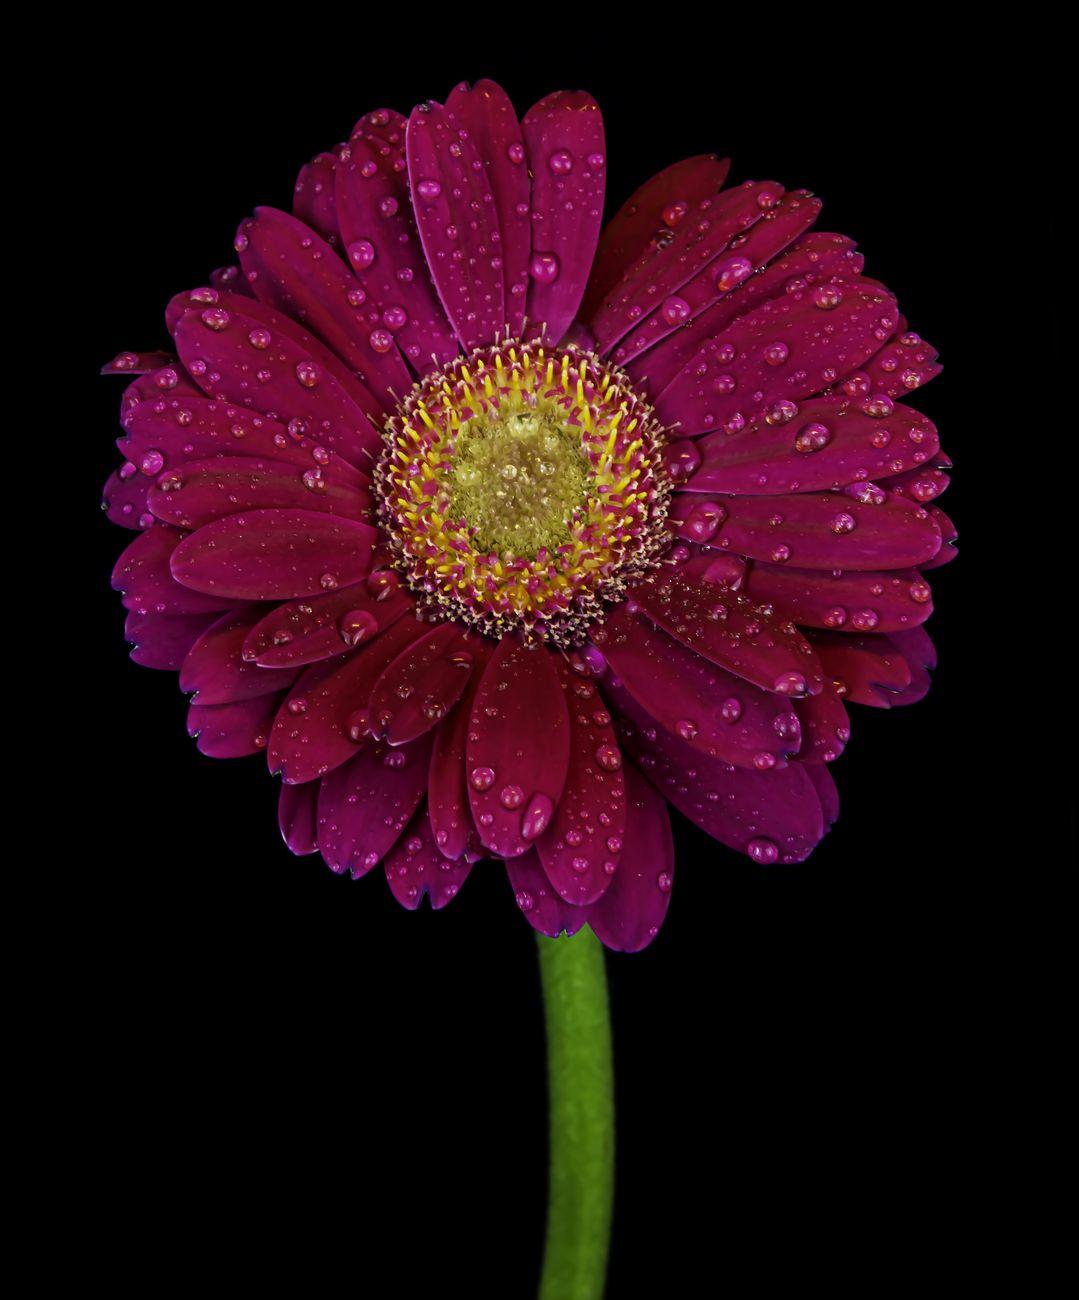 Pink gerbera droplets